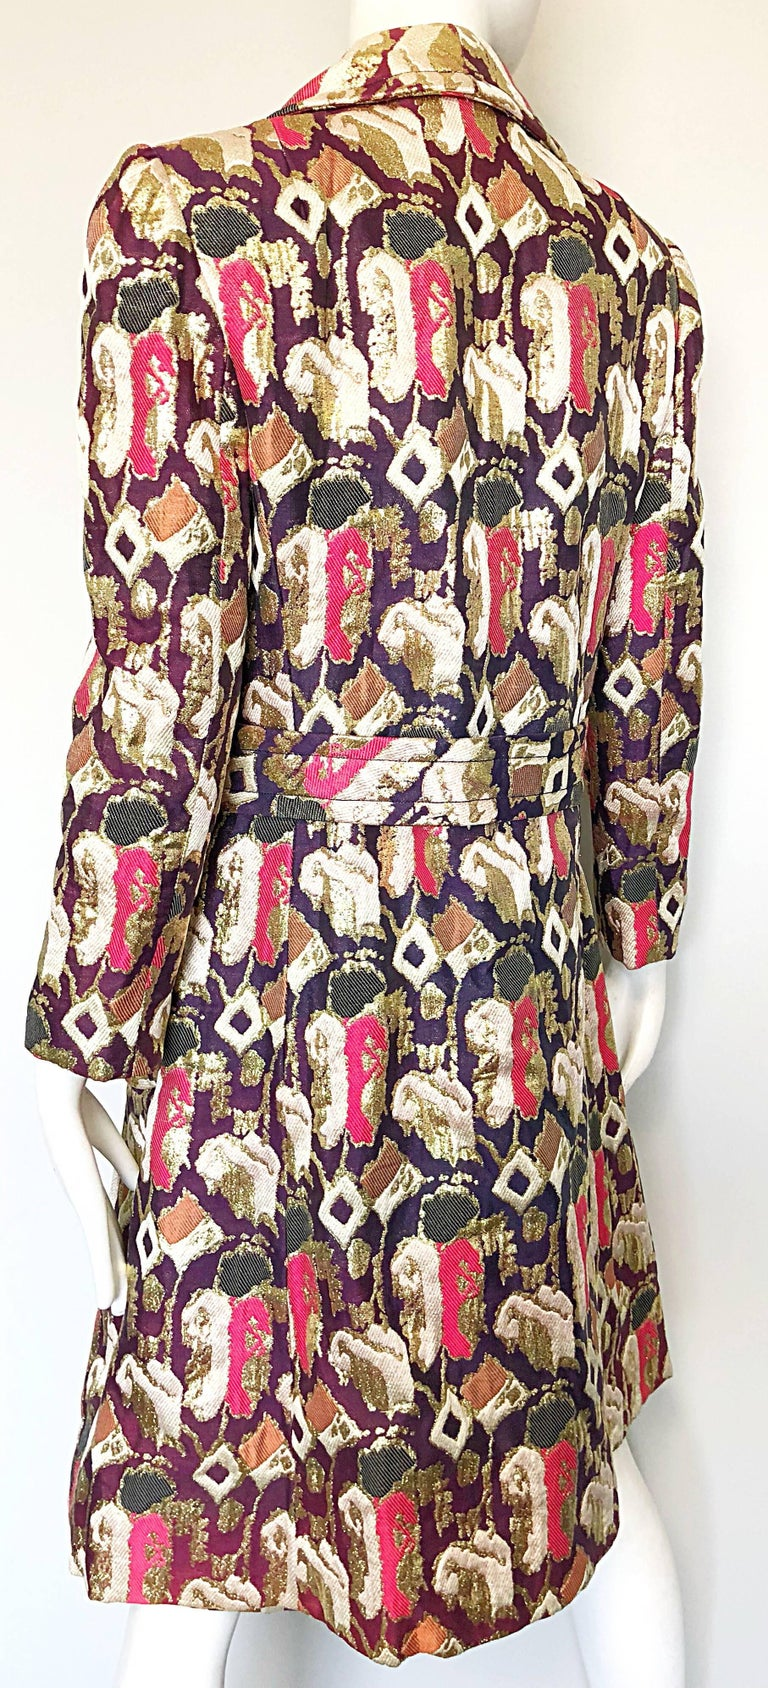 Women's 1960s Oscar de la Renta Silk Brocade A - Line 60s Vintage Dress and Jacket For Sale